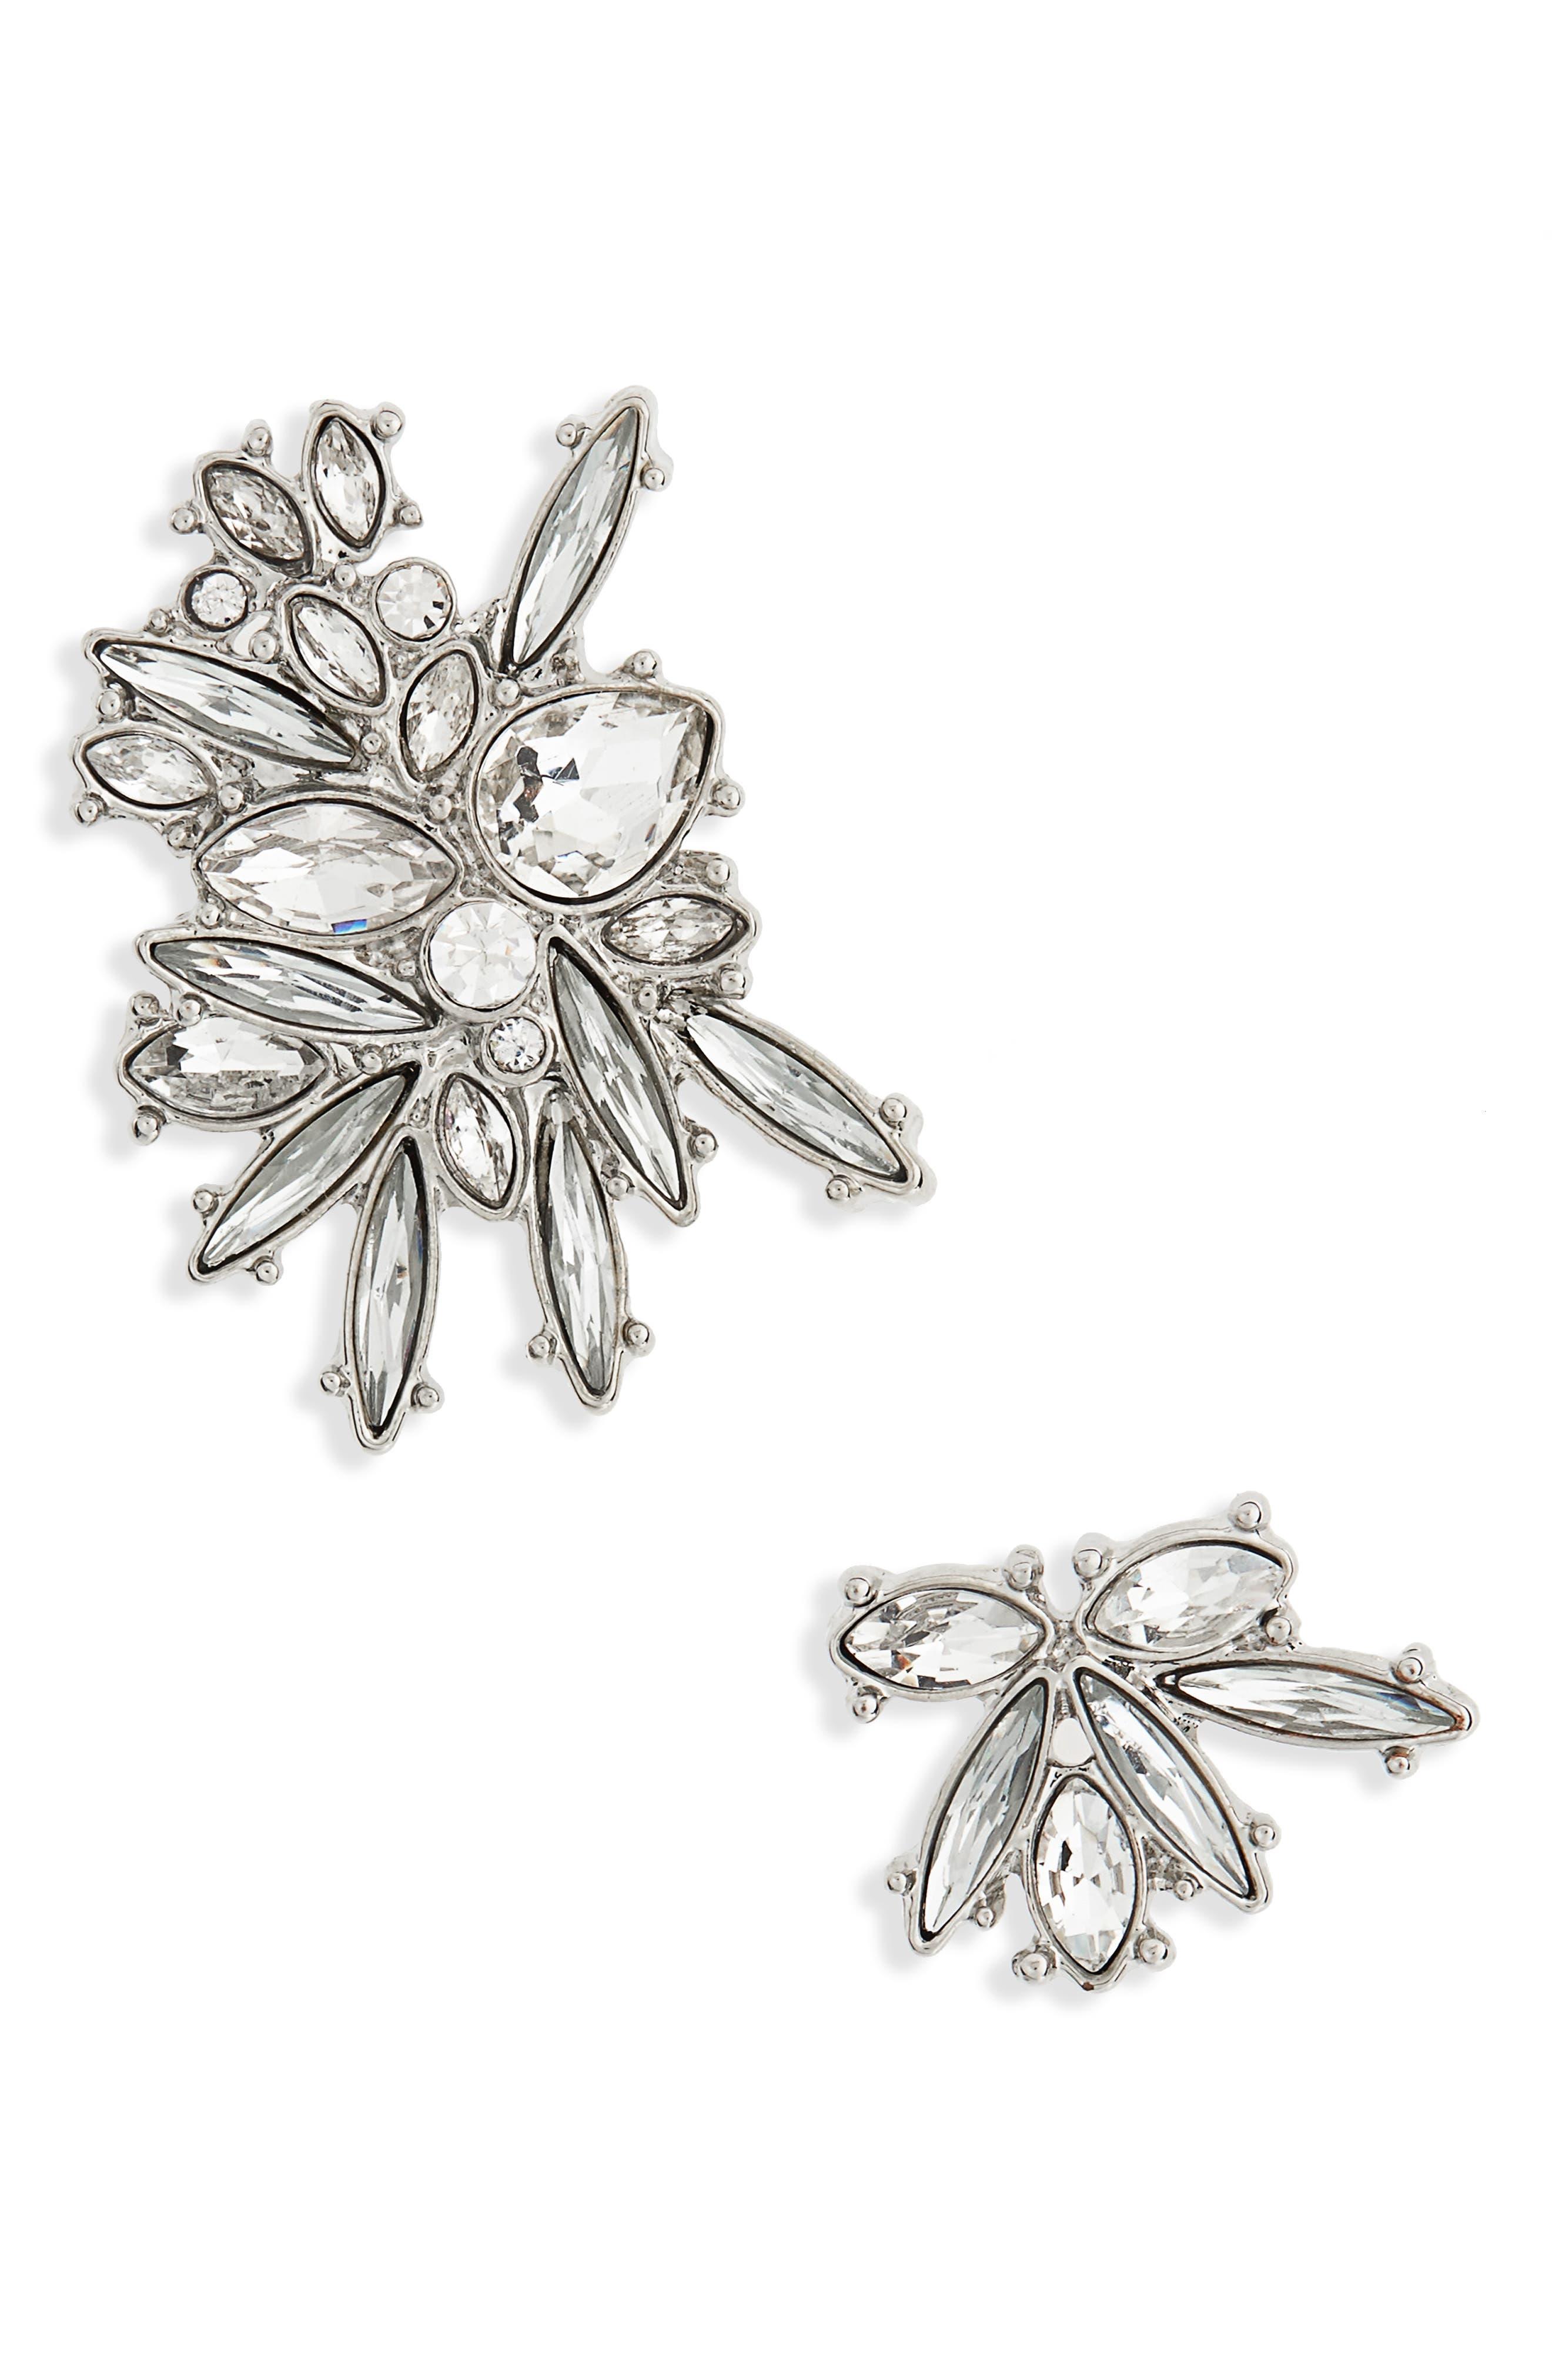 Main Image - BaubleBar Titania Crystal Stud Earrings